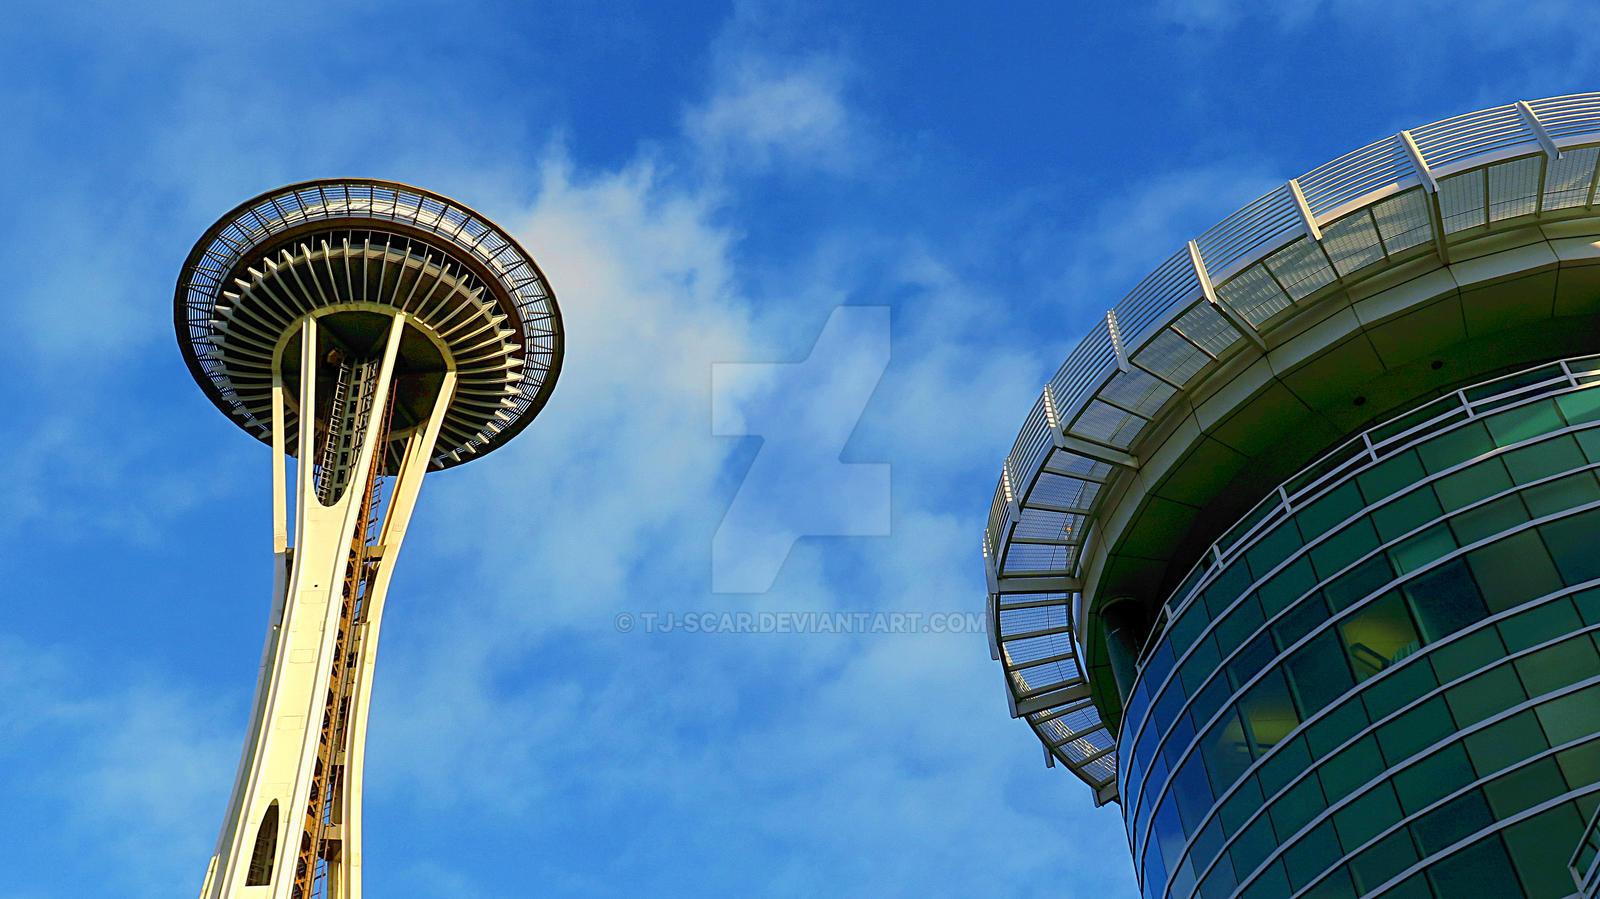 Seattlecircles by TJ-Scar